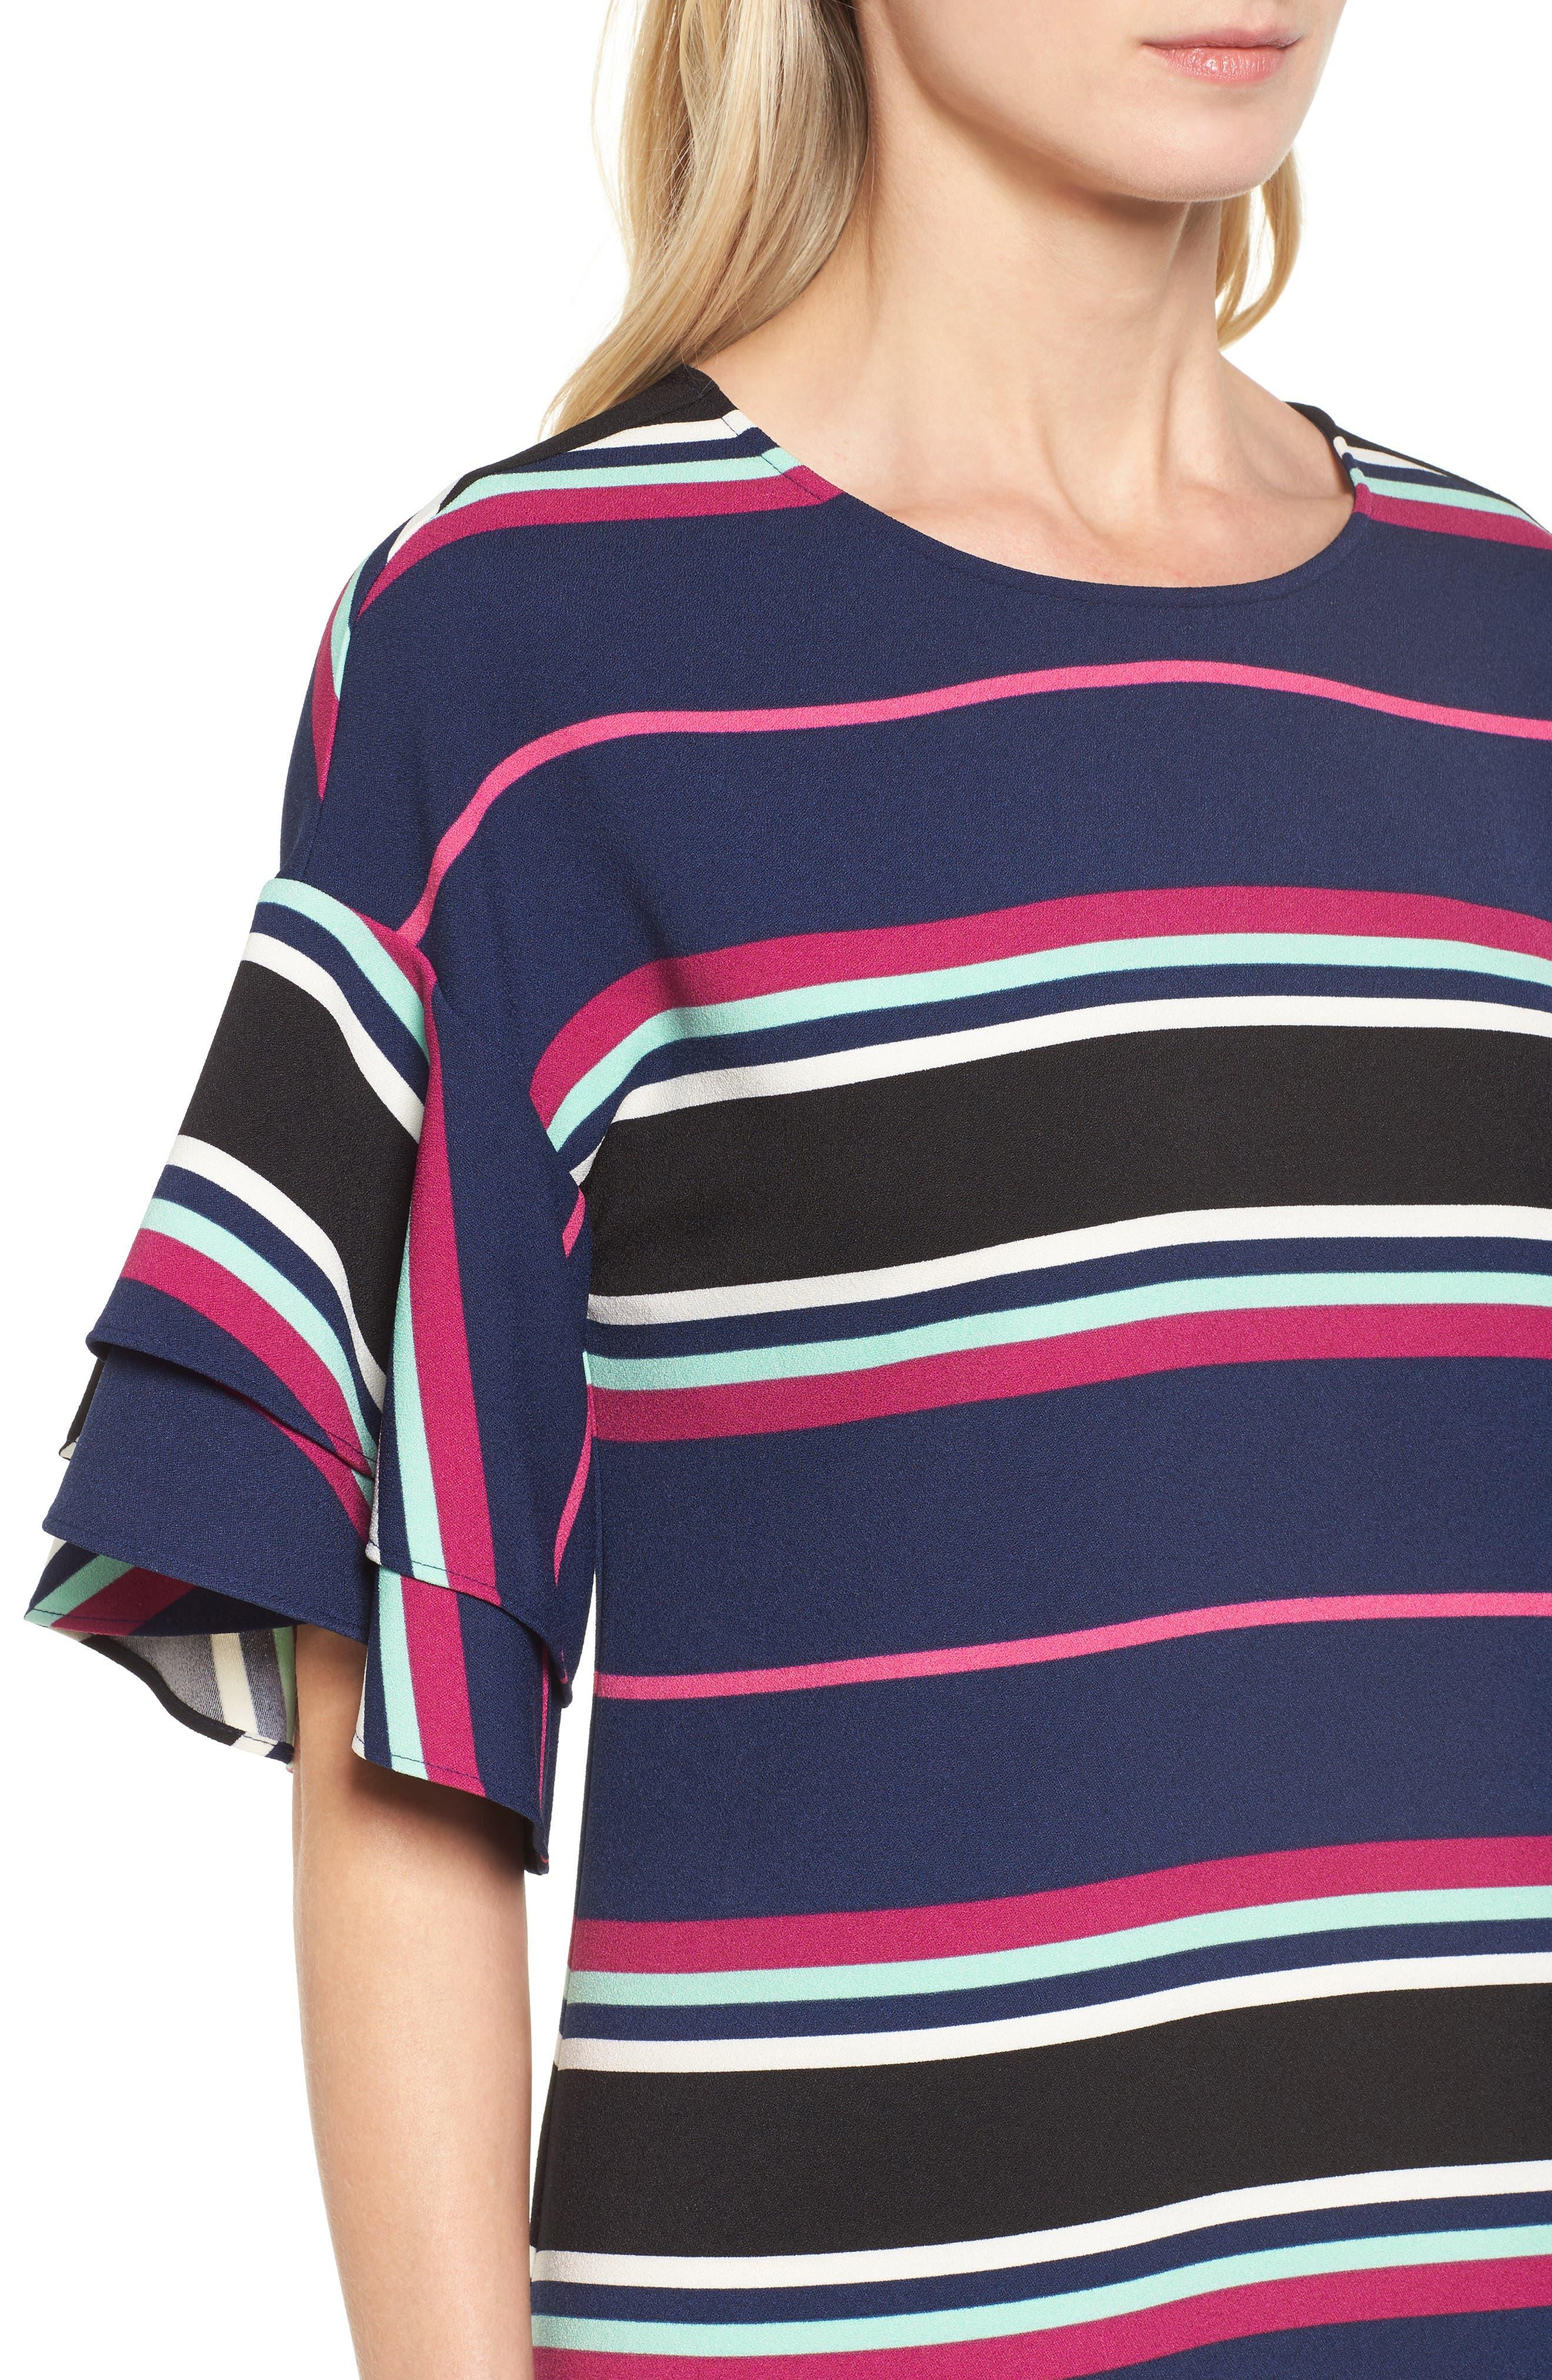 Ruffle Sleeve Shift Dress,                             Alternate thumbnail 4, color,                             Navy- Pink Multi Stripe